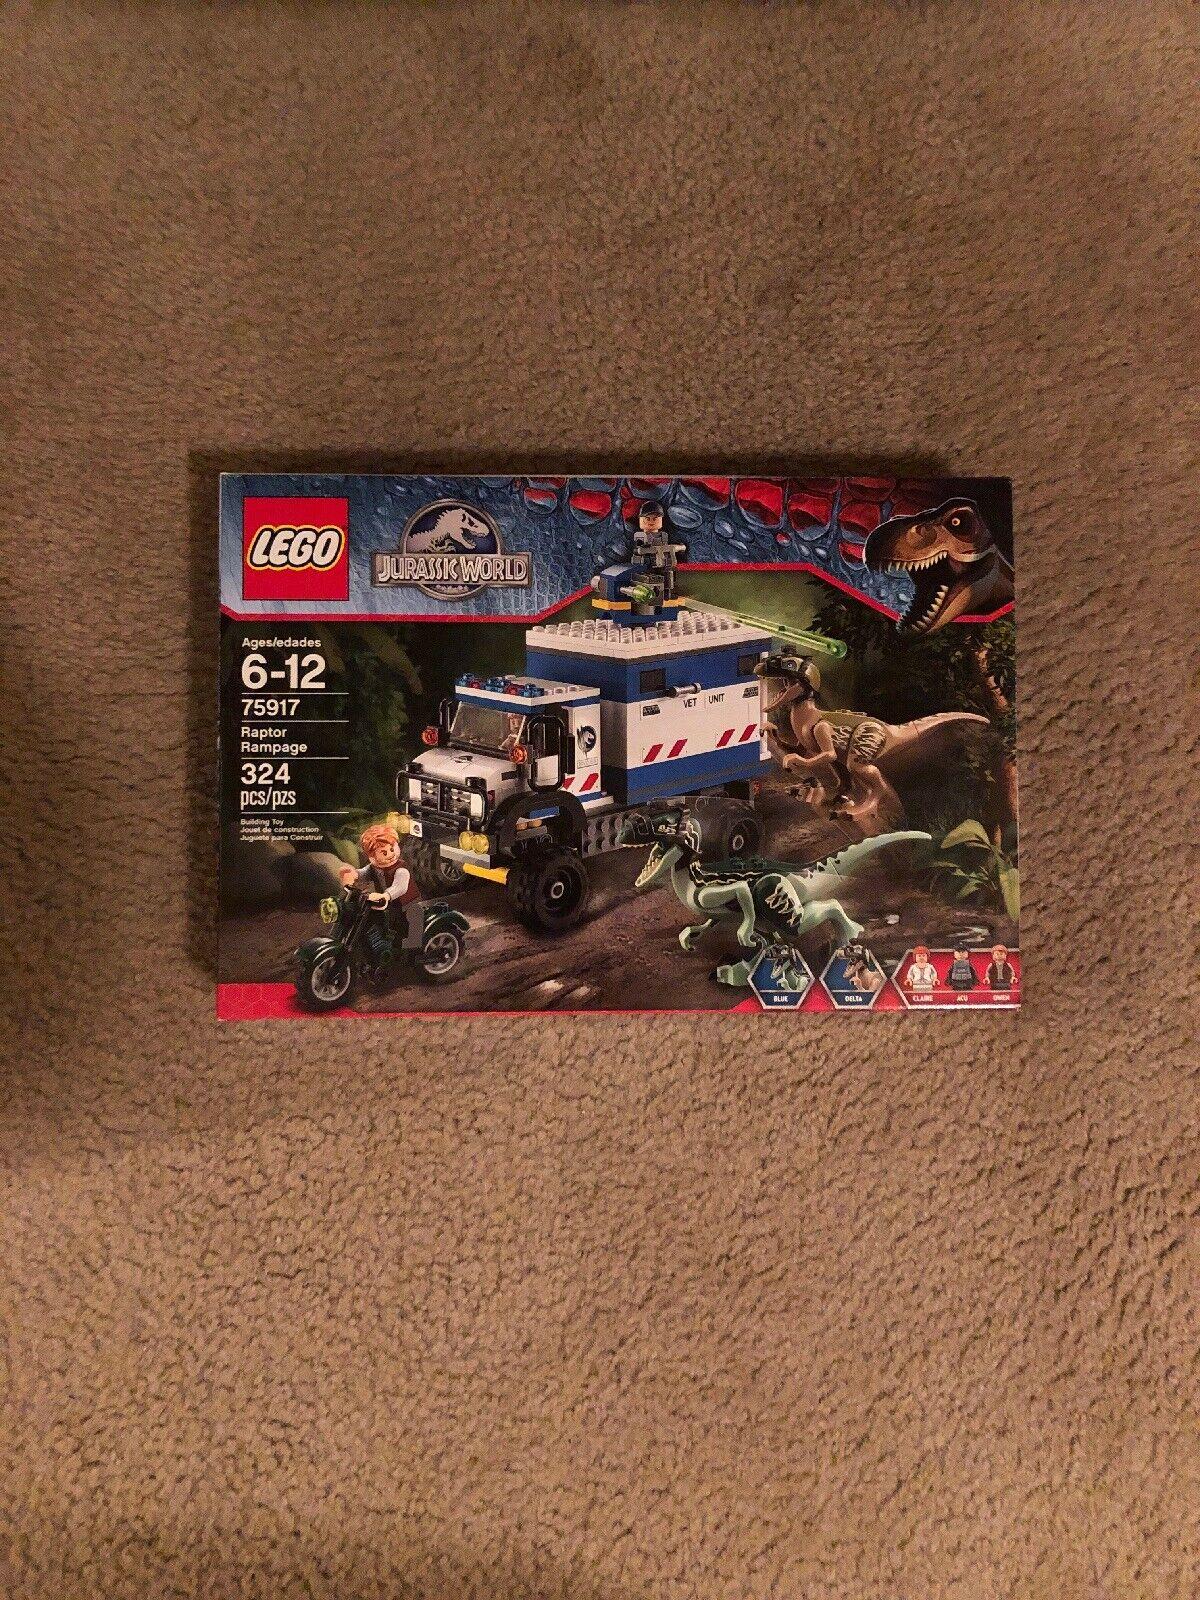 LEGO Jurassic World  75917 Raptor Rampage. New. Retirot. NO RESERVE